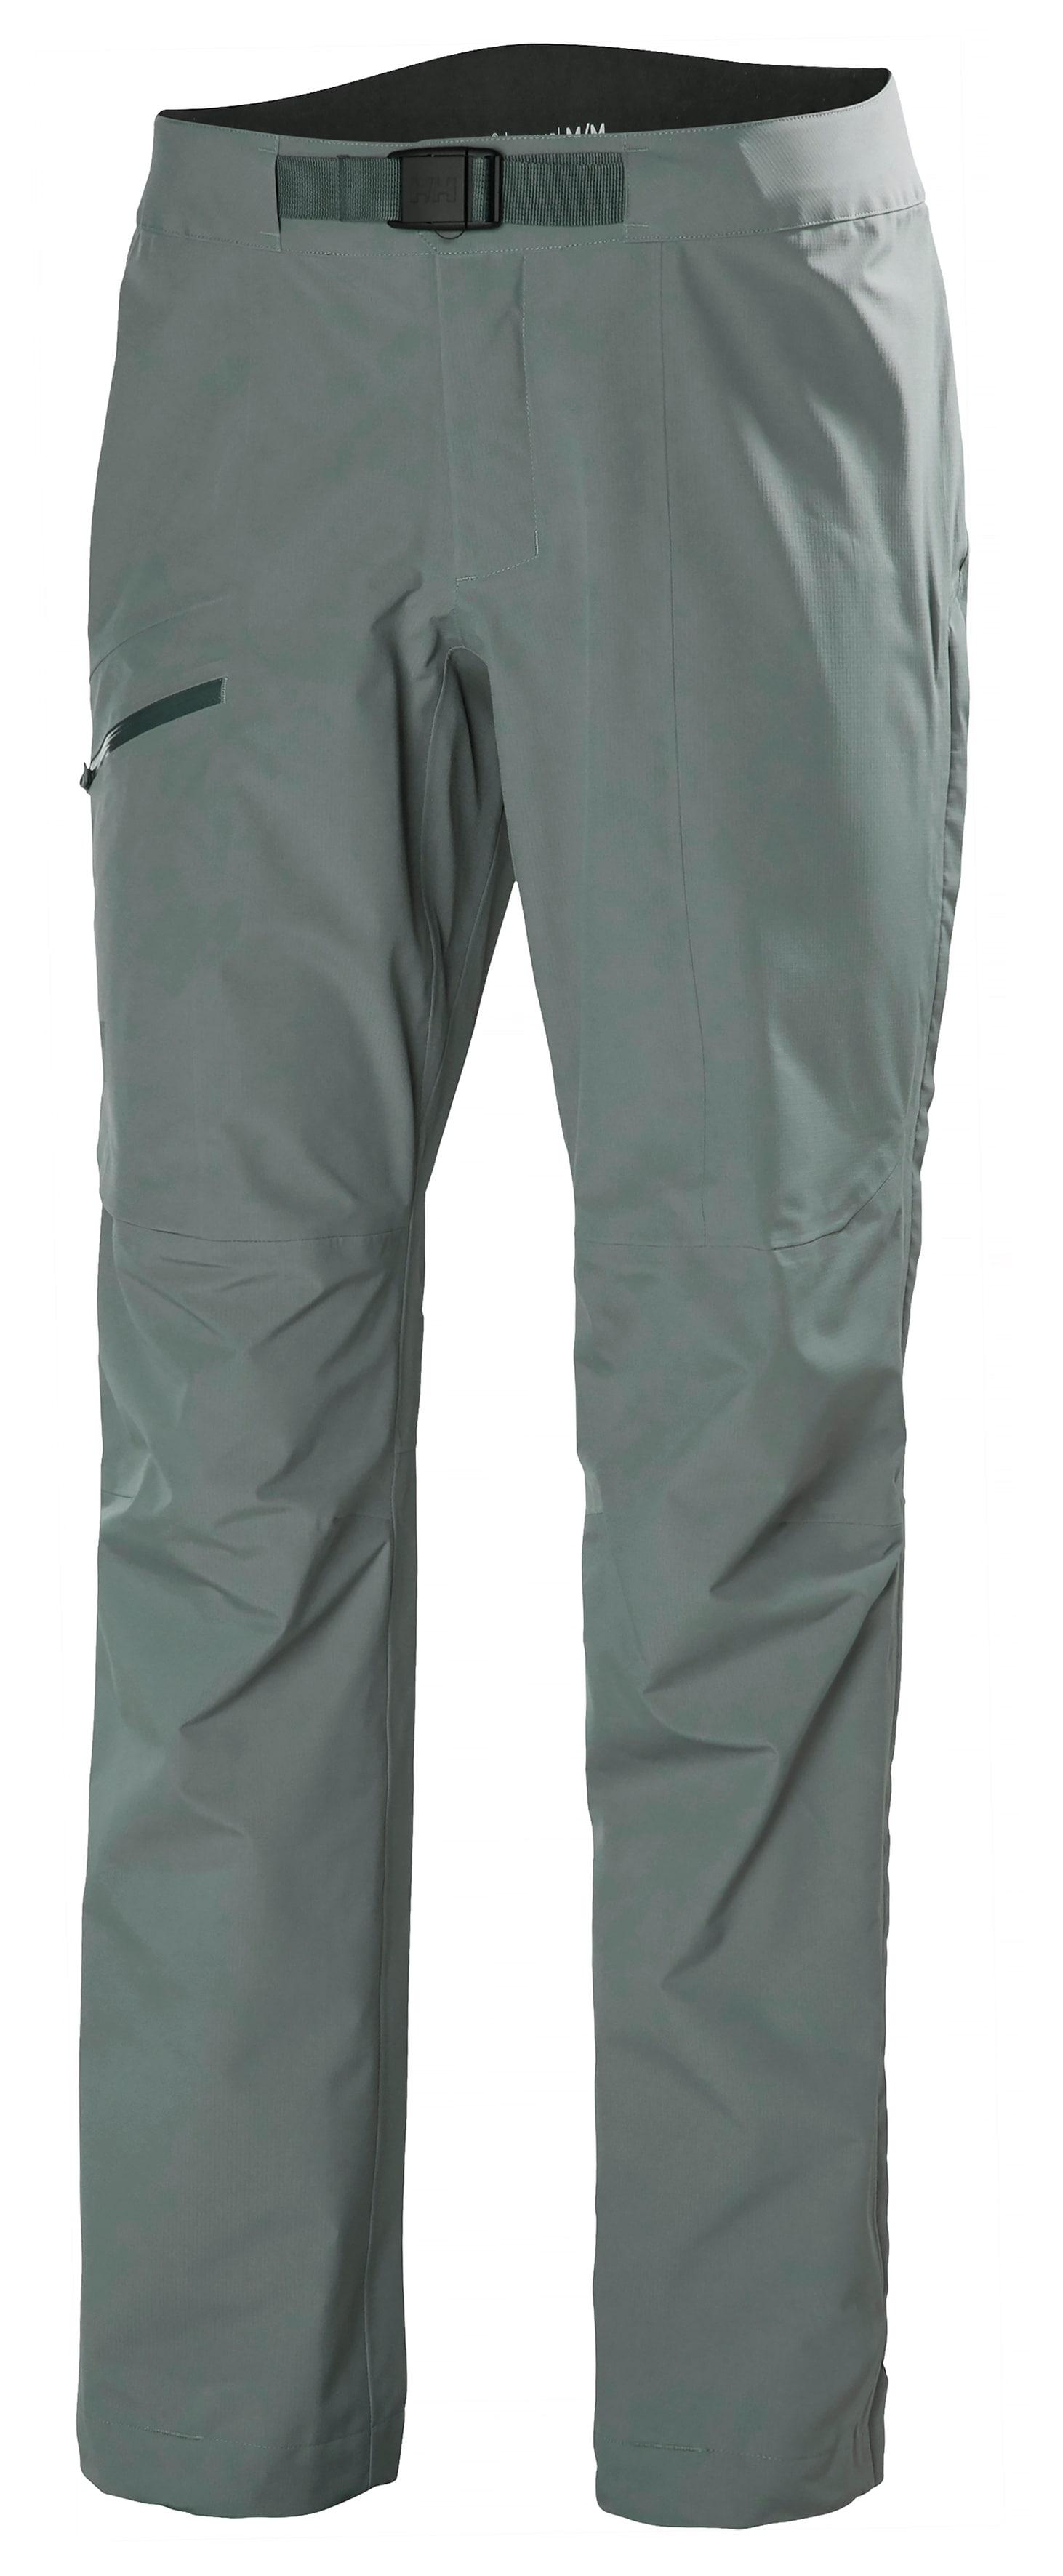 Helly Hansen Verglas Infinity Shell Pant, W's